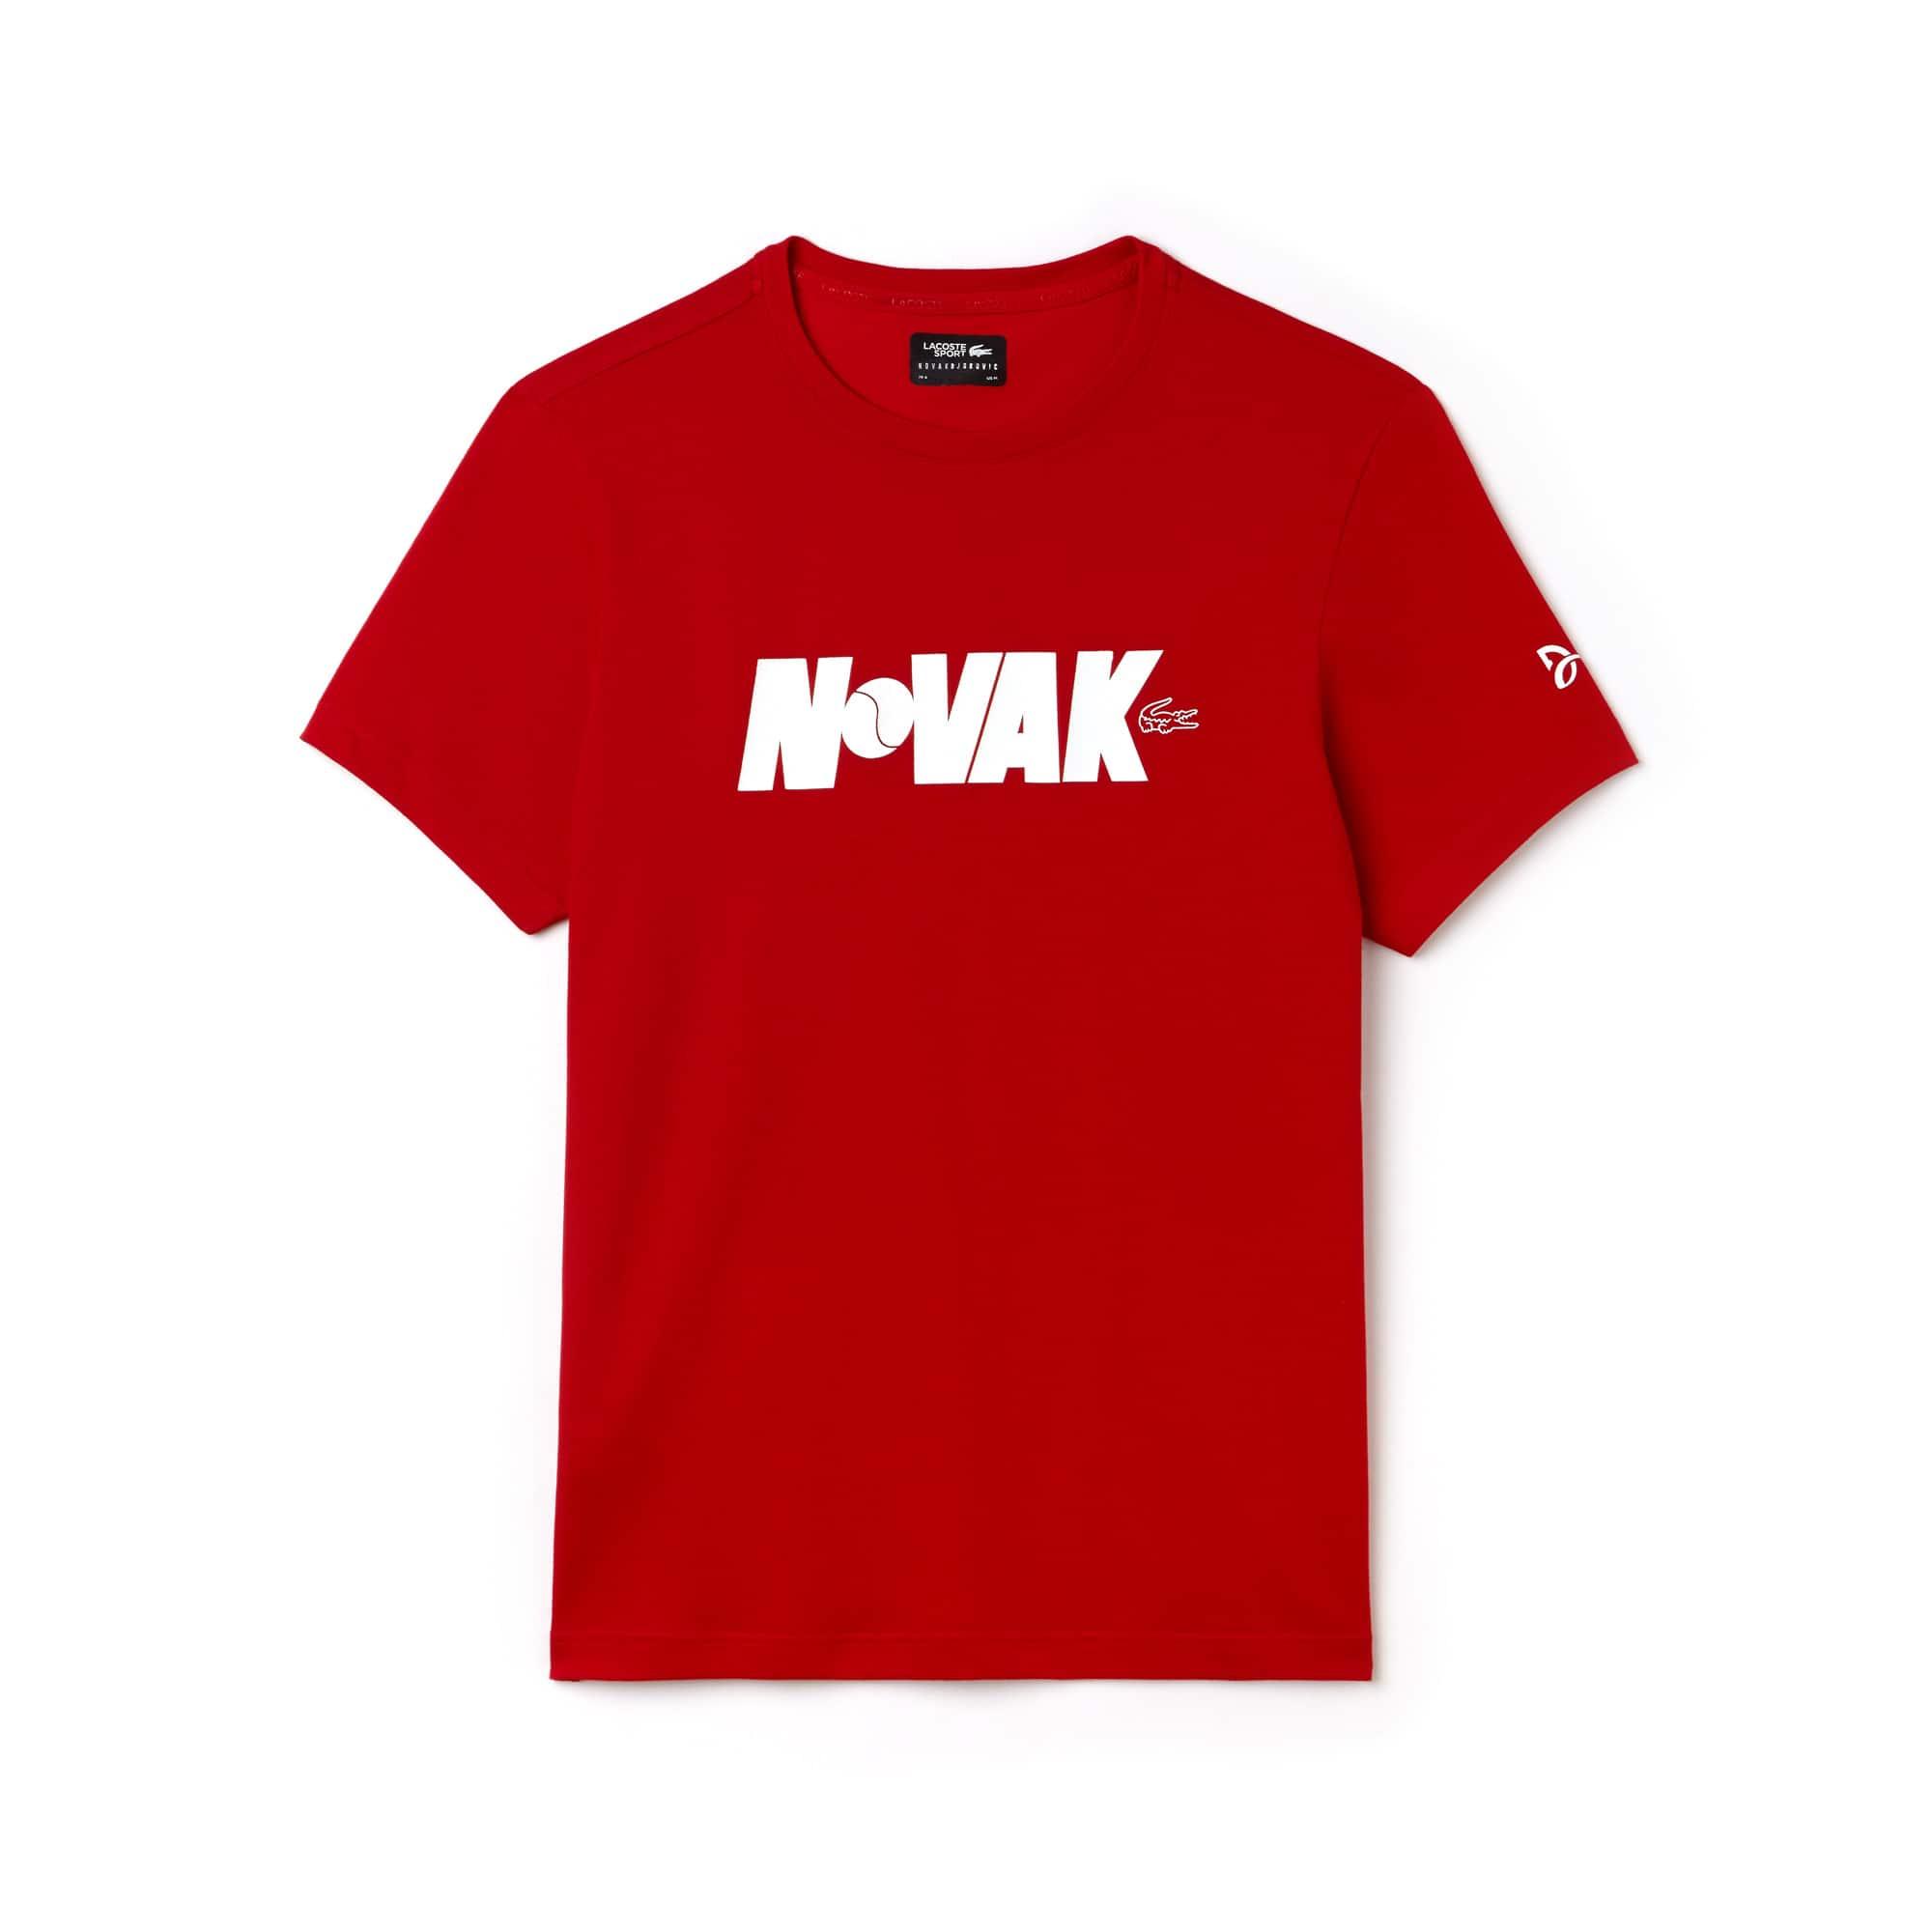 Men's SPORT Crew Neck Technical Jersey T-shirt - Novak Djokovic Supporter Collection